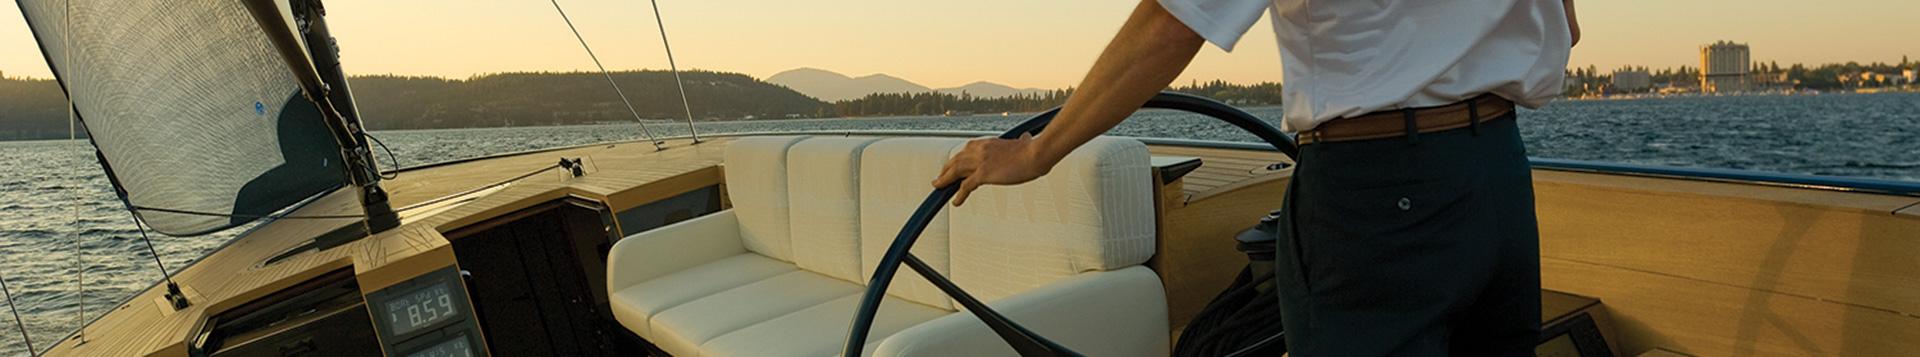 Sailing Magazine: Mountaintop Thoroughbred